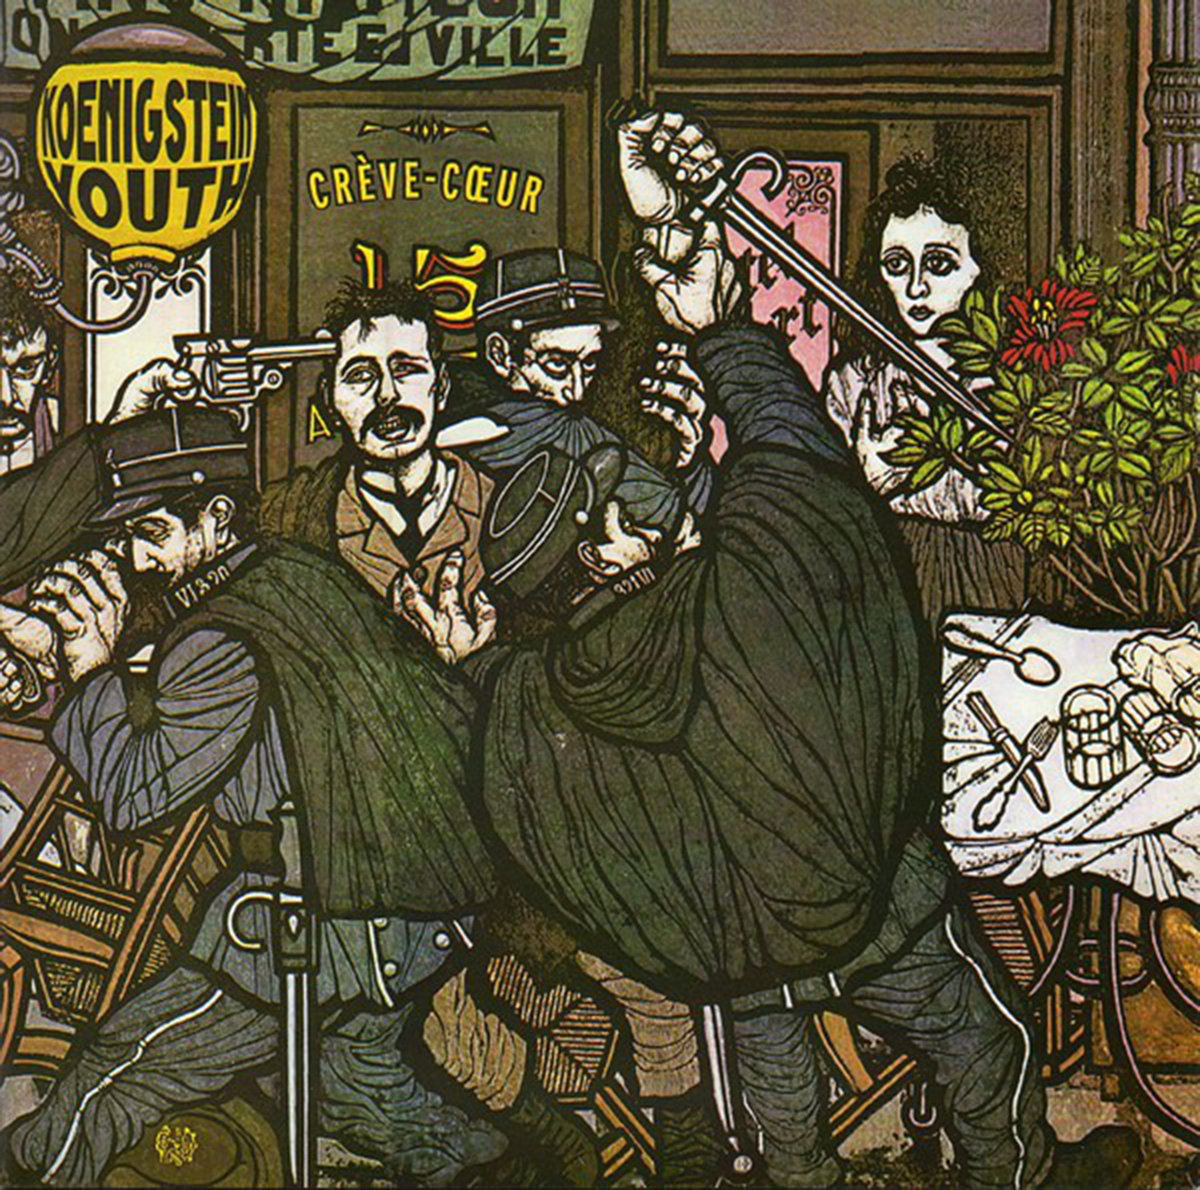 Koenigstein Youth - Crève Coeur